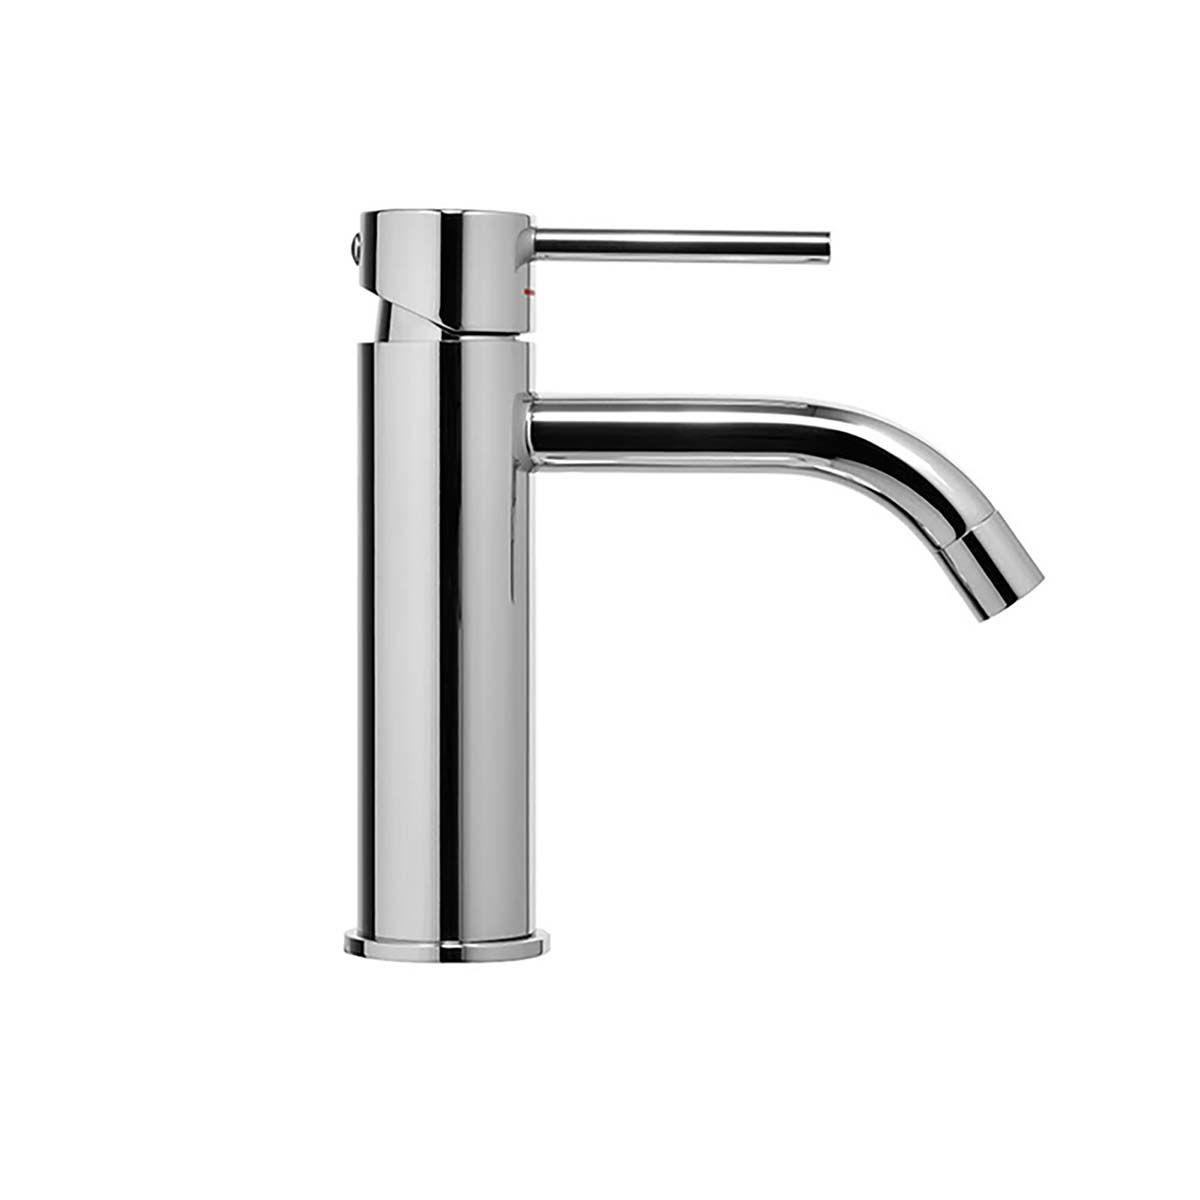 ws bath collections light exclusive lig 071 single lever bathroom faucet